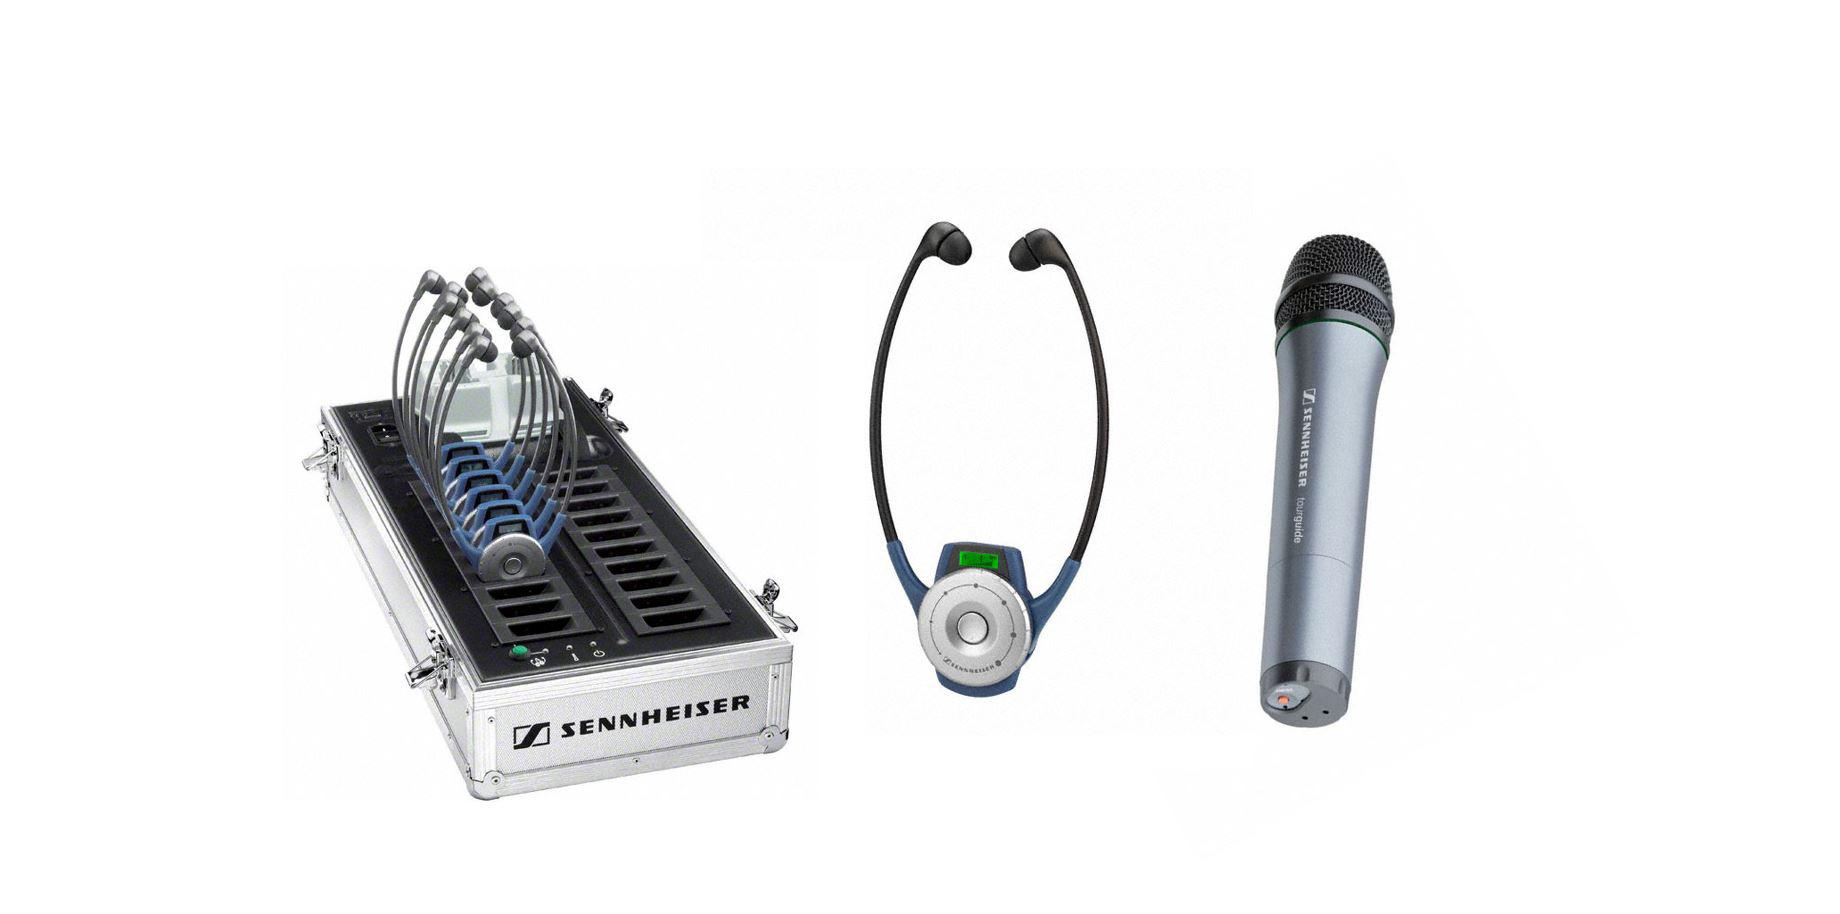 Sennheiser TG2020-20HH Tourguide 2020-20 Handheld Complete